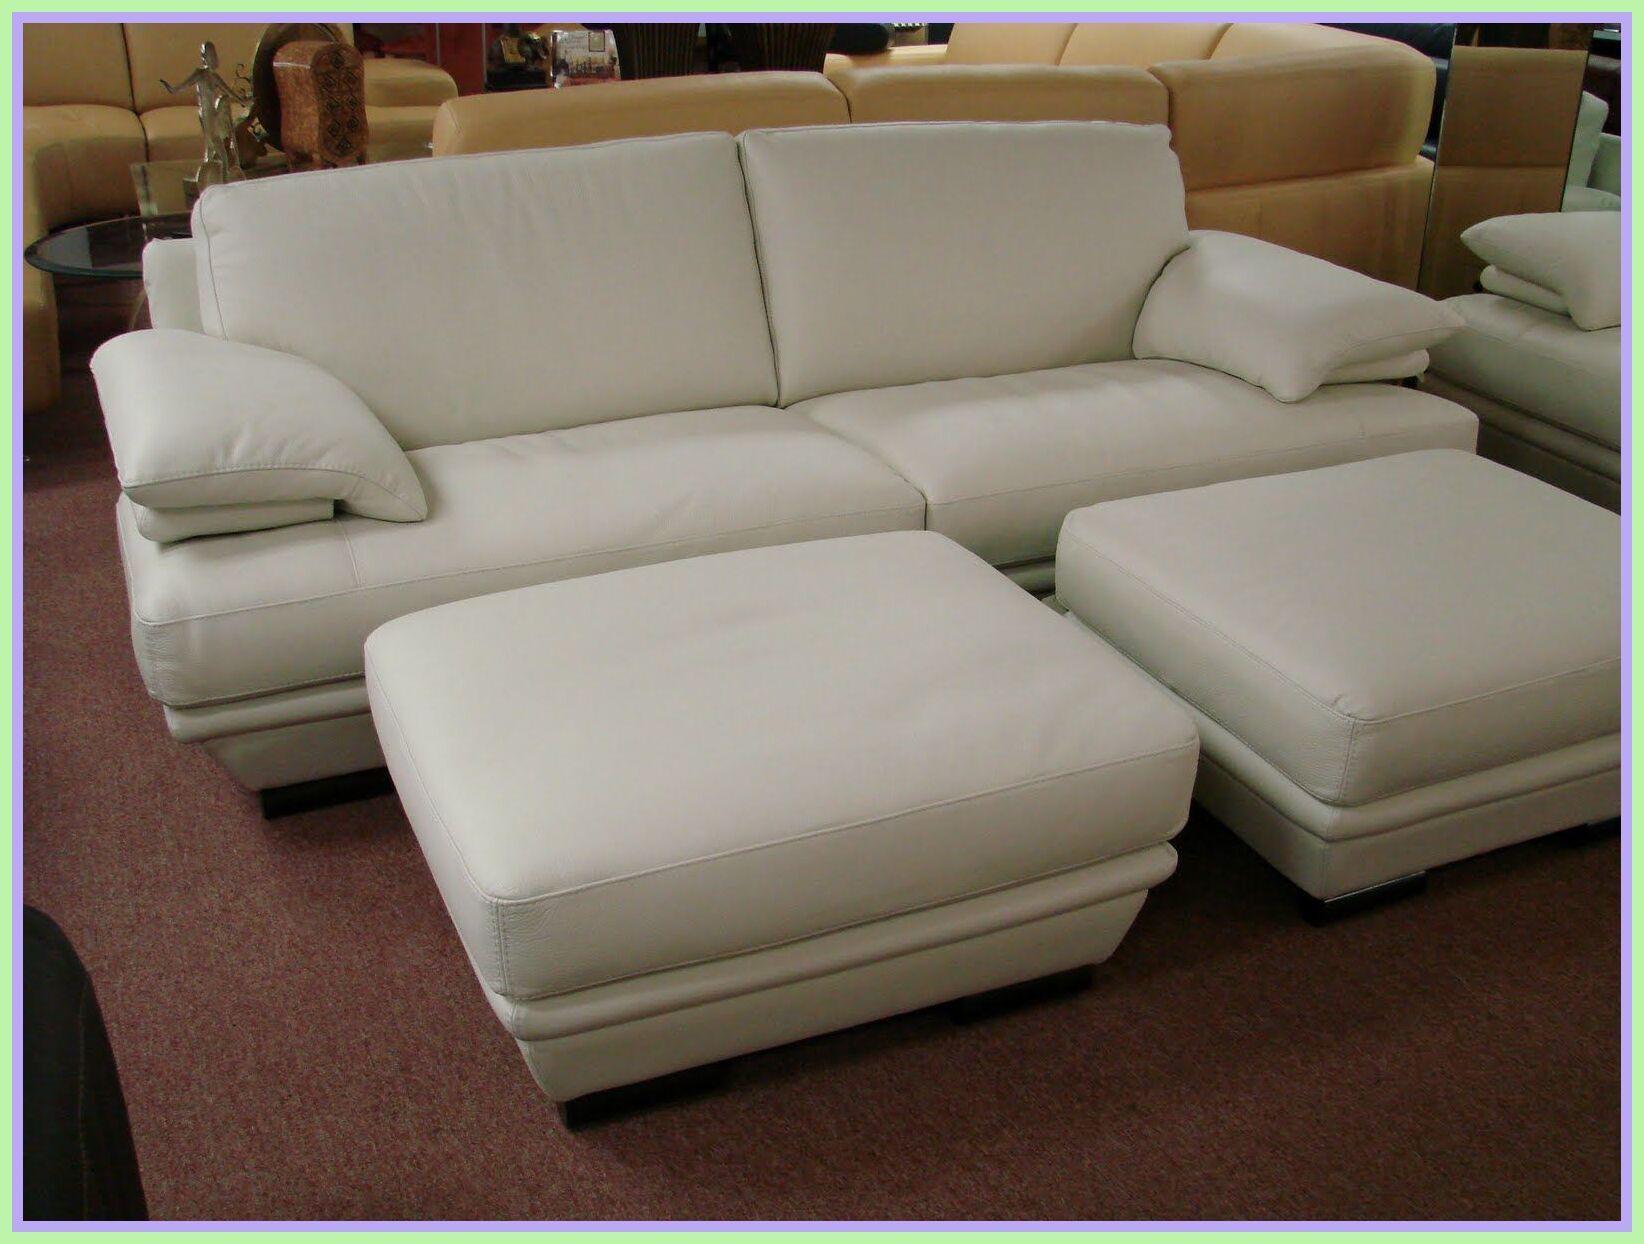 59 Reference Of White Sofa Elegant In 2020 White Leather Sofas White Sofa Set Best Leather Sofa